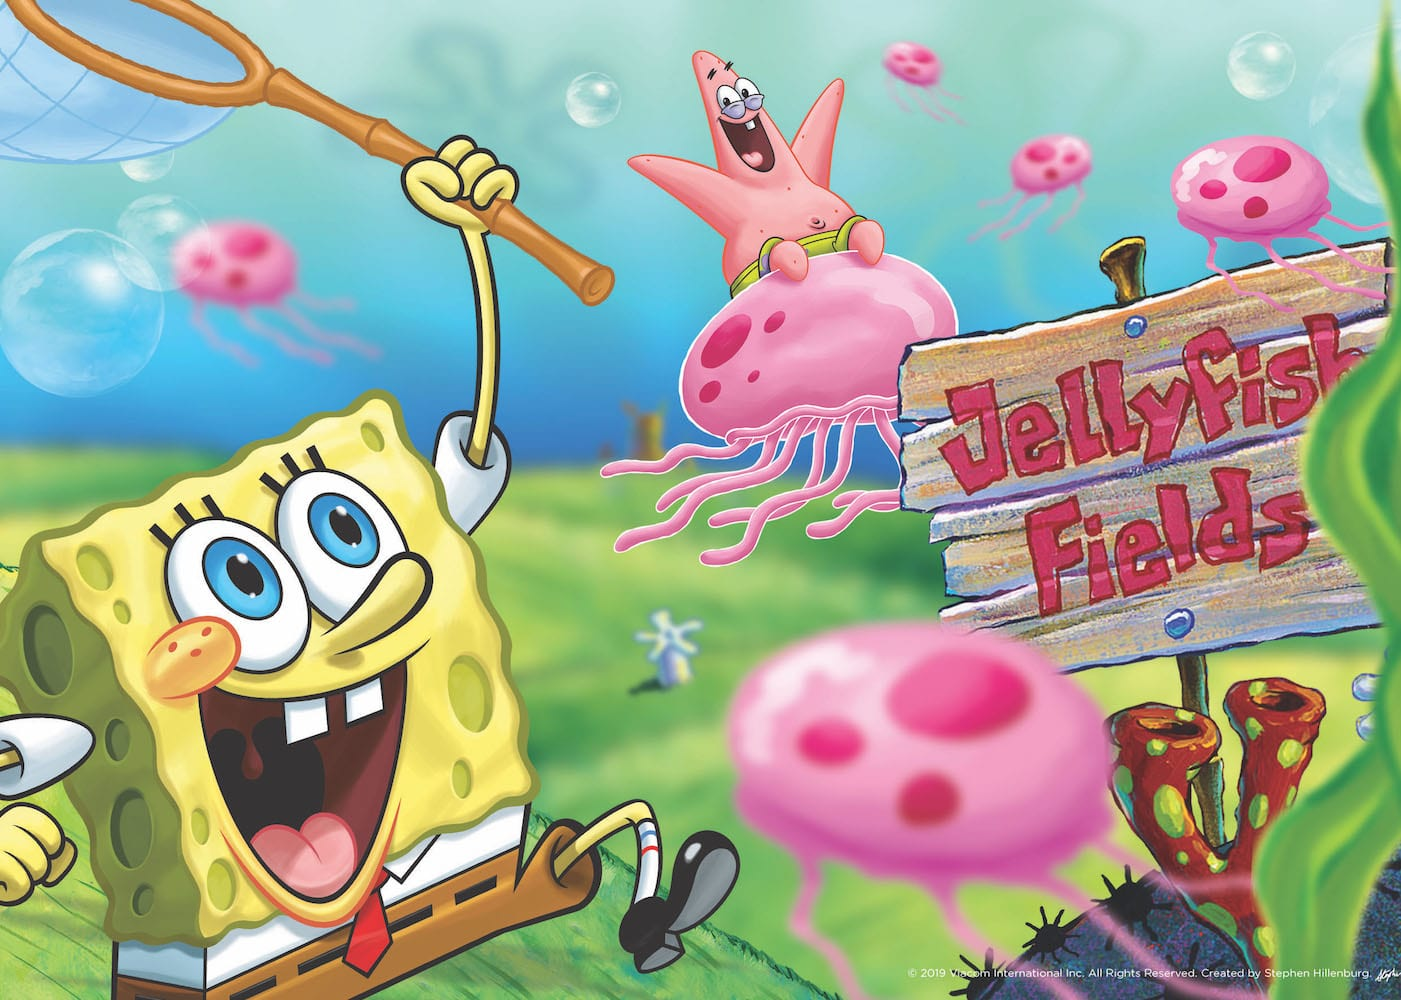 Nickelodeon's SpongeBob SquarePants 20th birthday Singtel